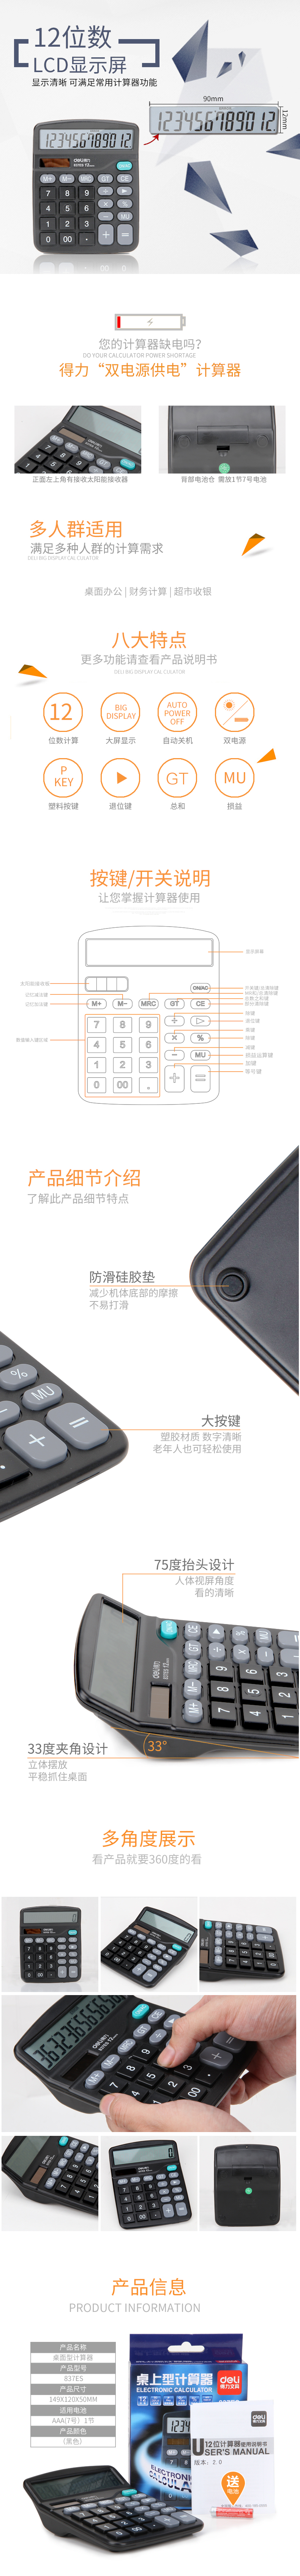 837ES-桌上型计算器-PC端.jpg